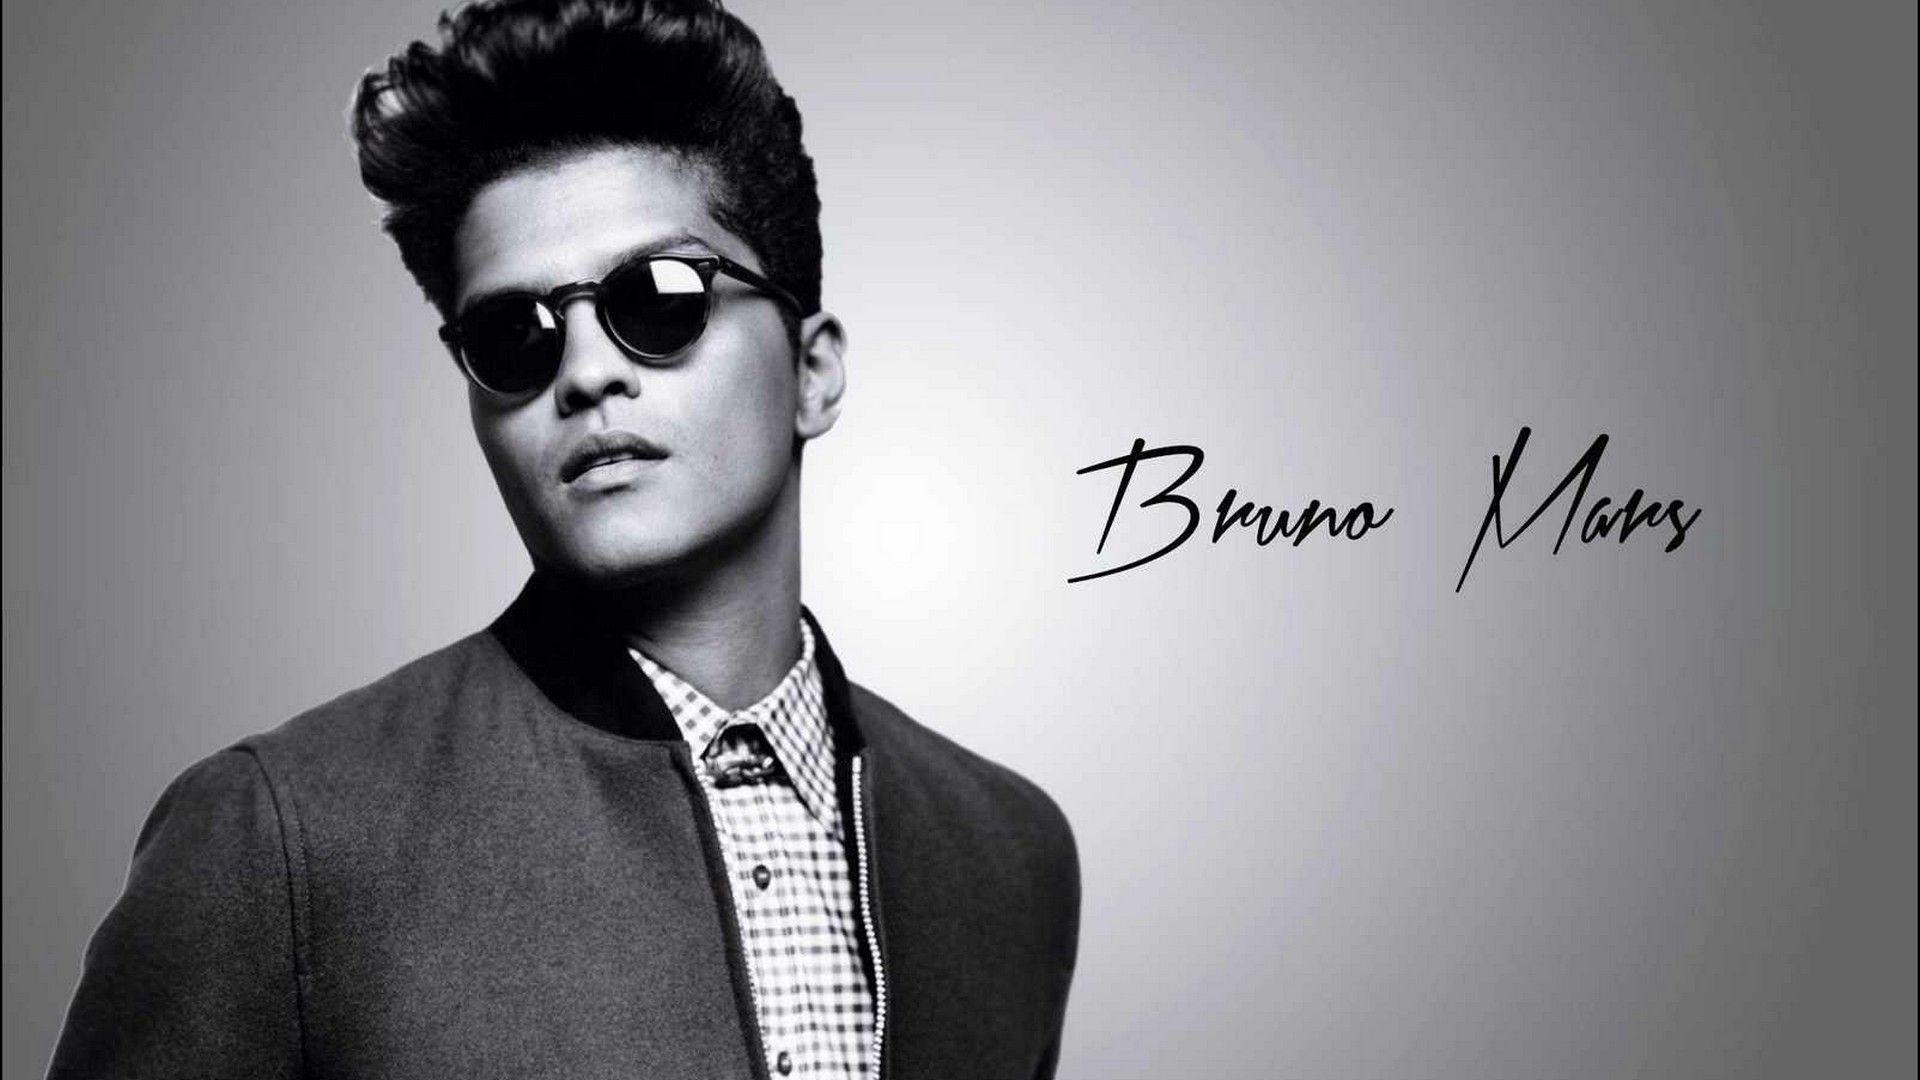 Top Bruno Mars Wallpaper Ideas – Inspire Your creativeness